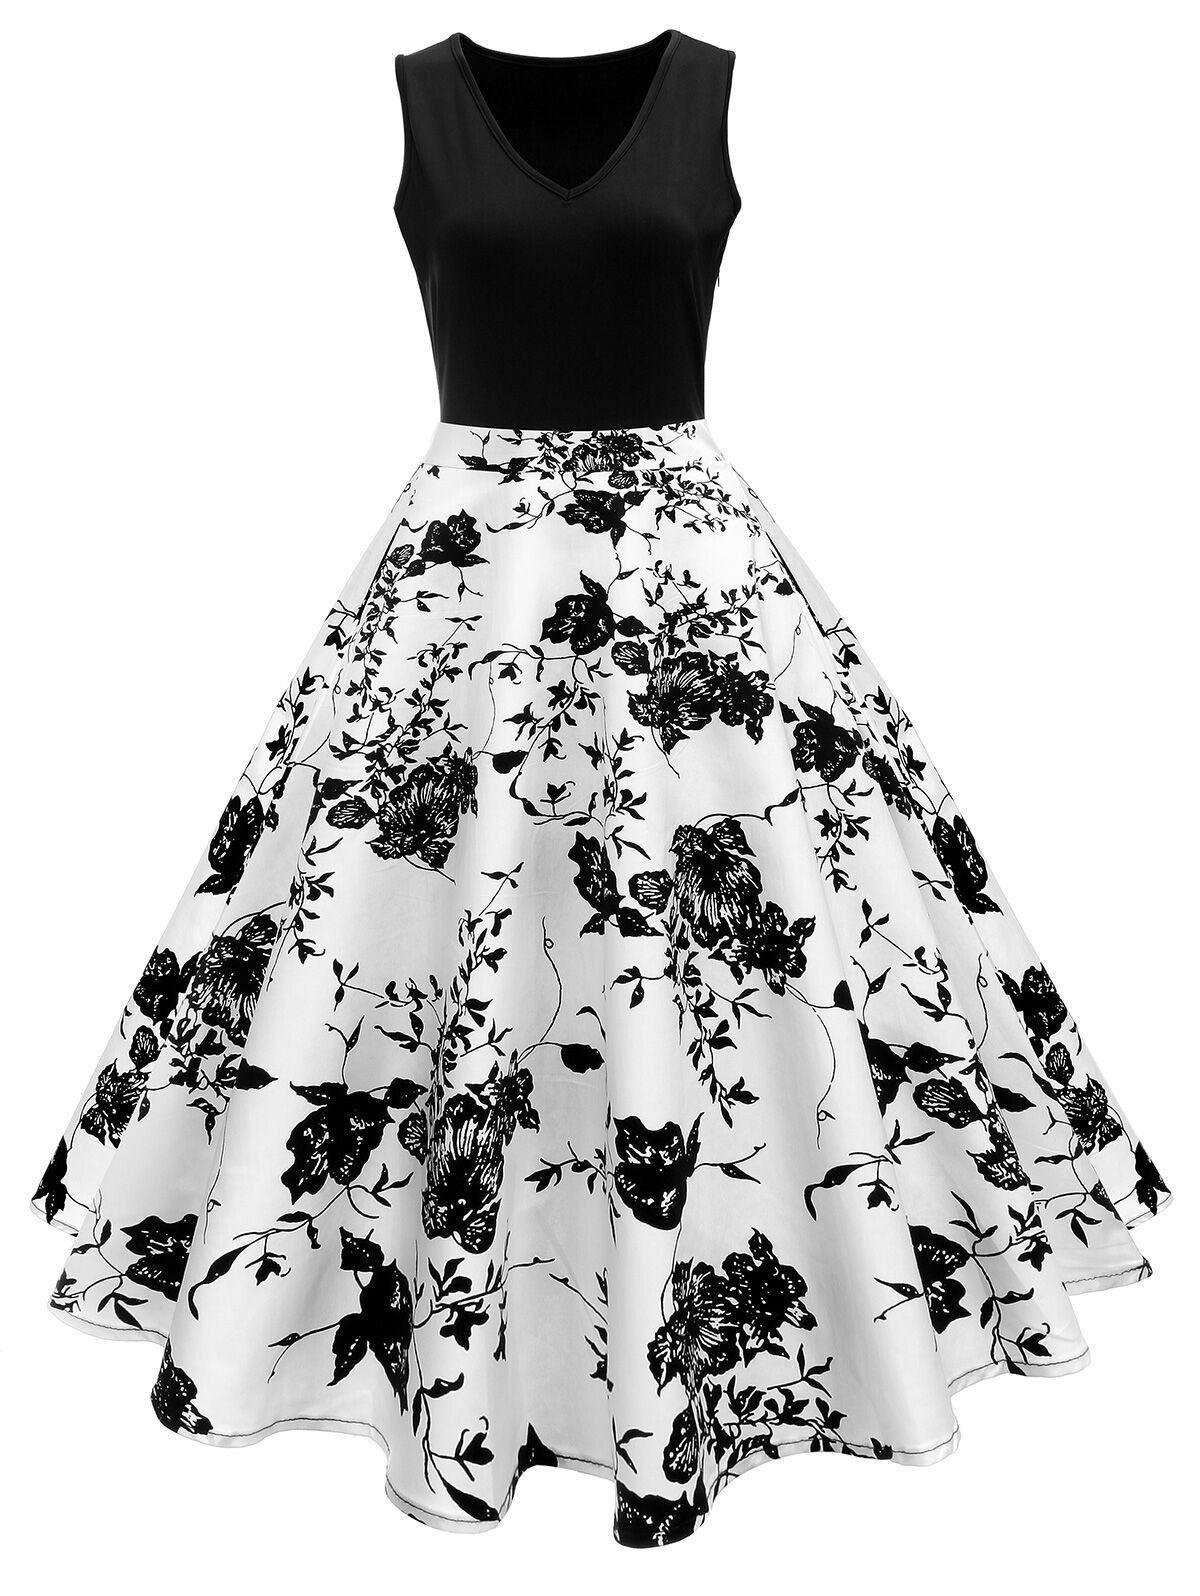 18s Floral Swing Dress in 18  Kleider, Edle kleider, Retro